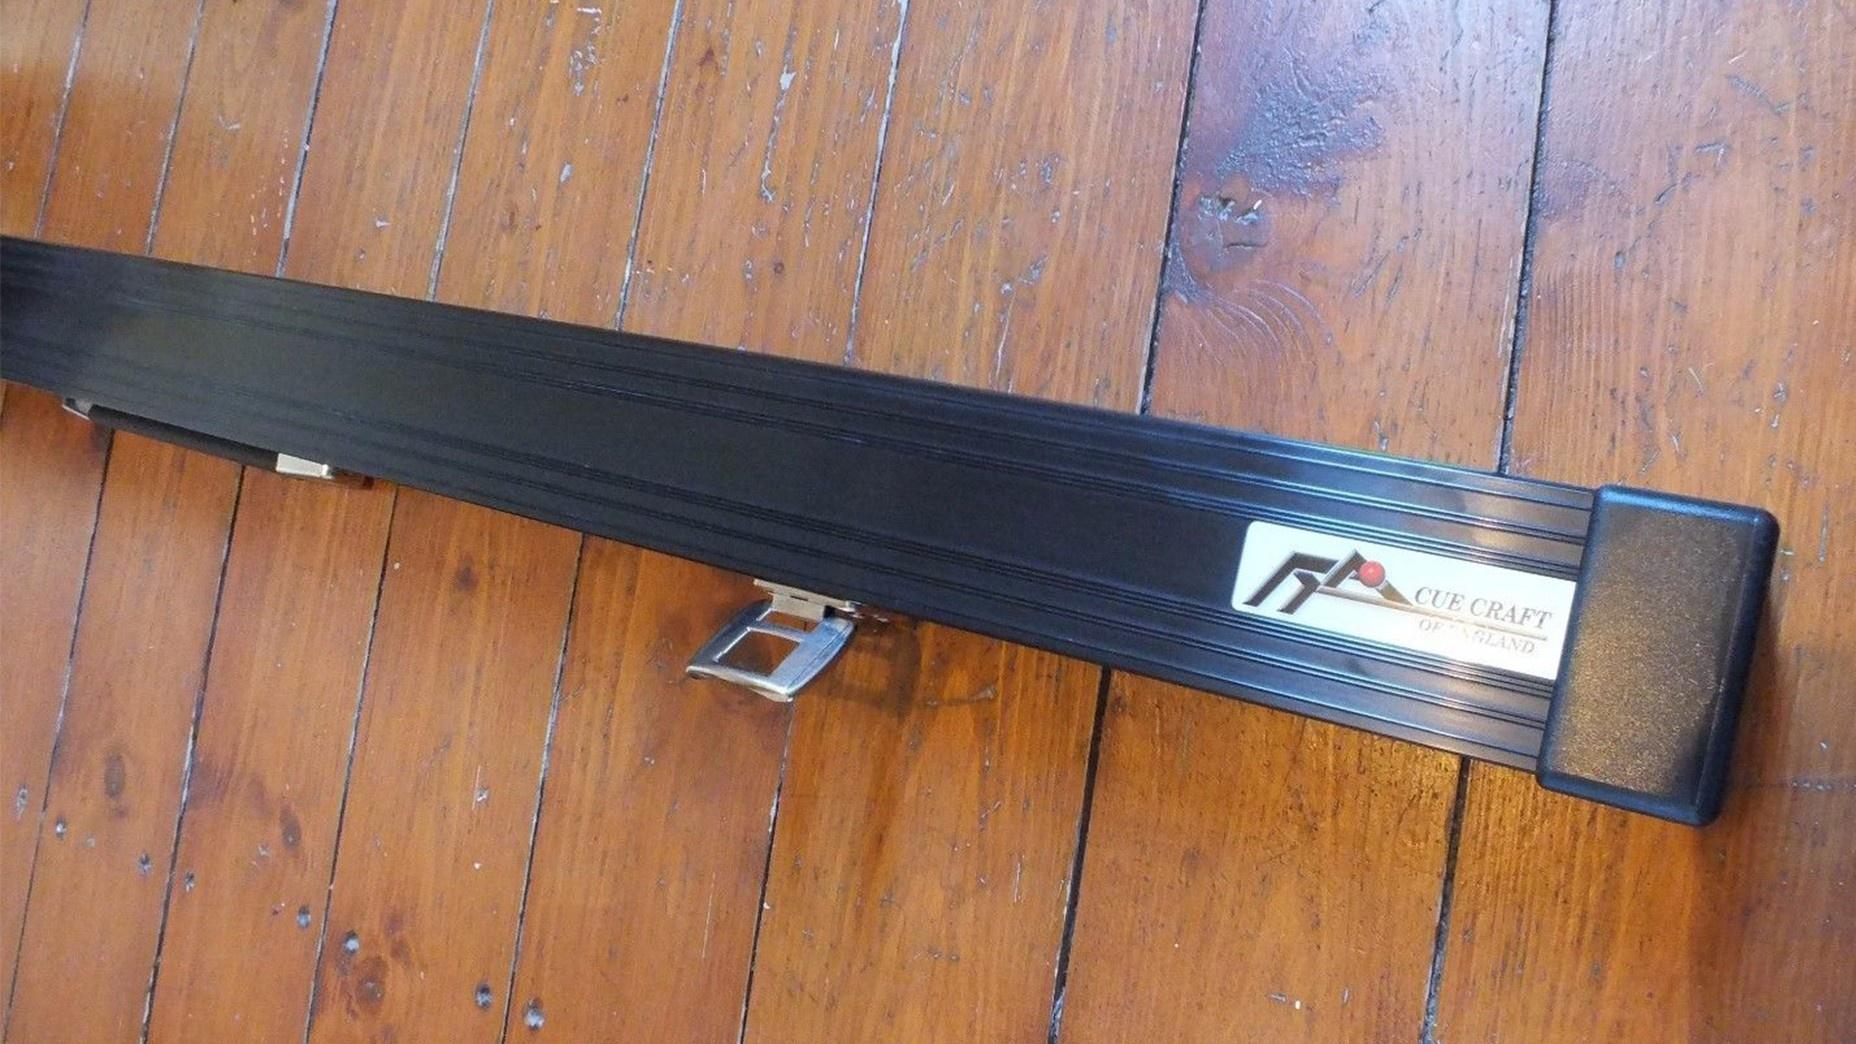 Cue Craft Case 3/4 Length, Black